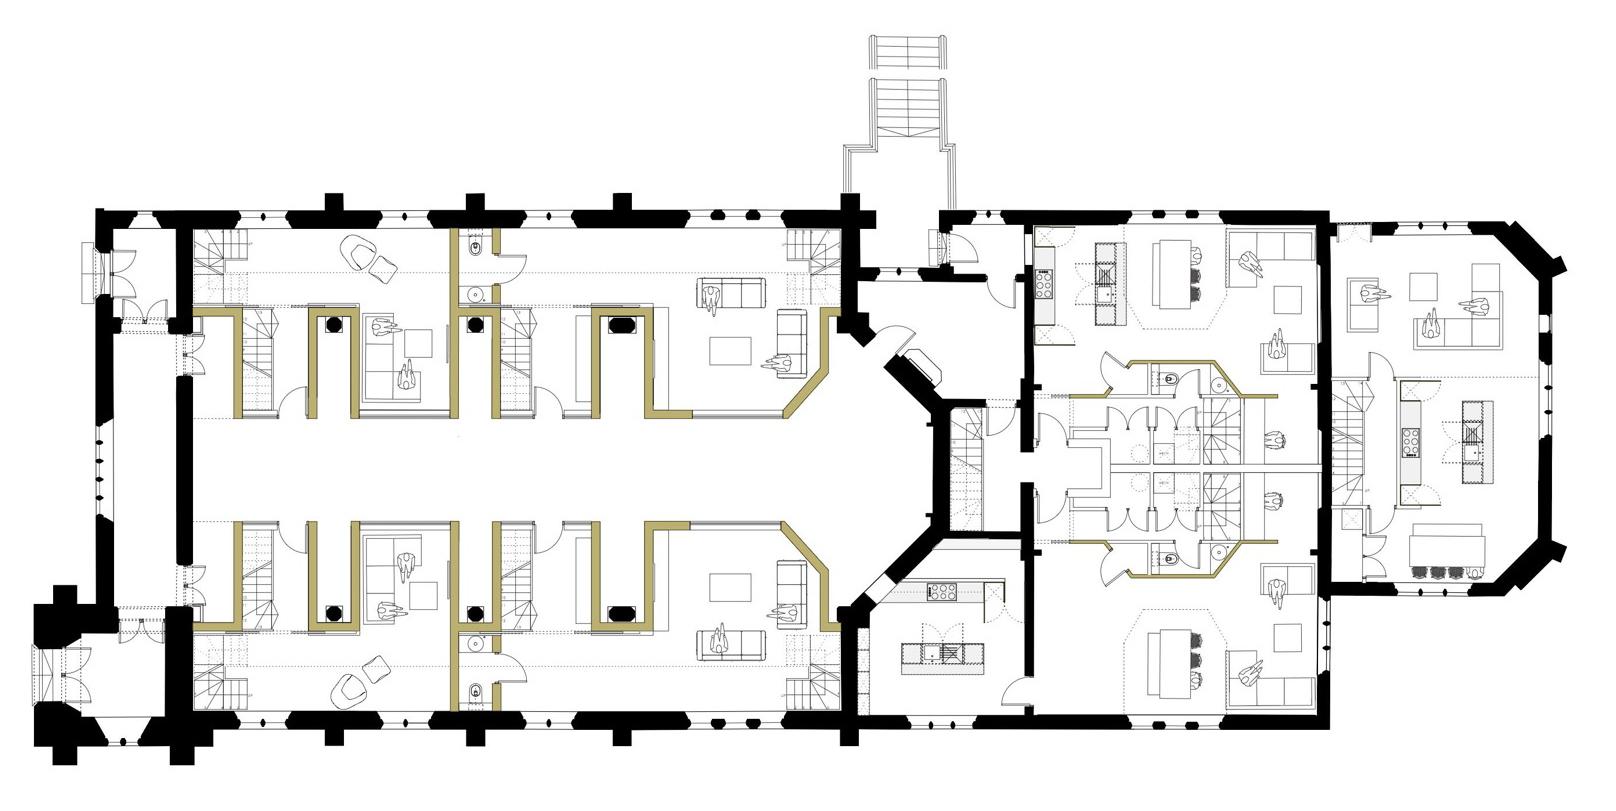 OSA_A184_GROUND PLAN